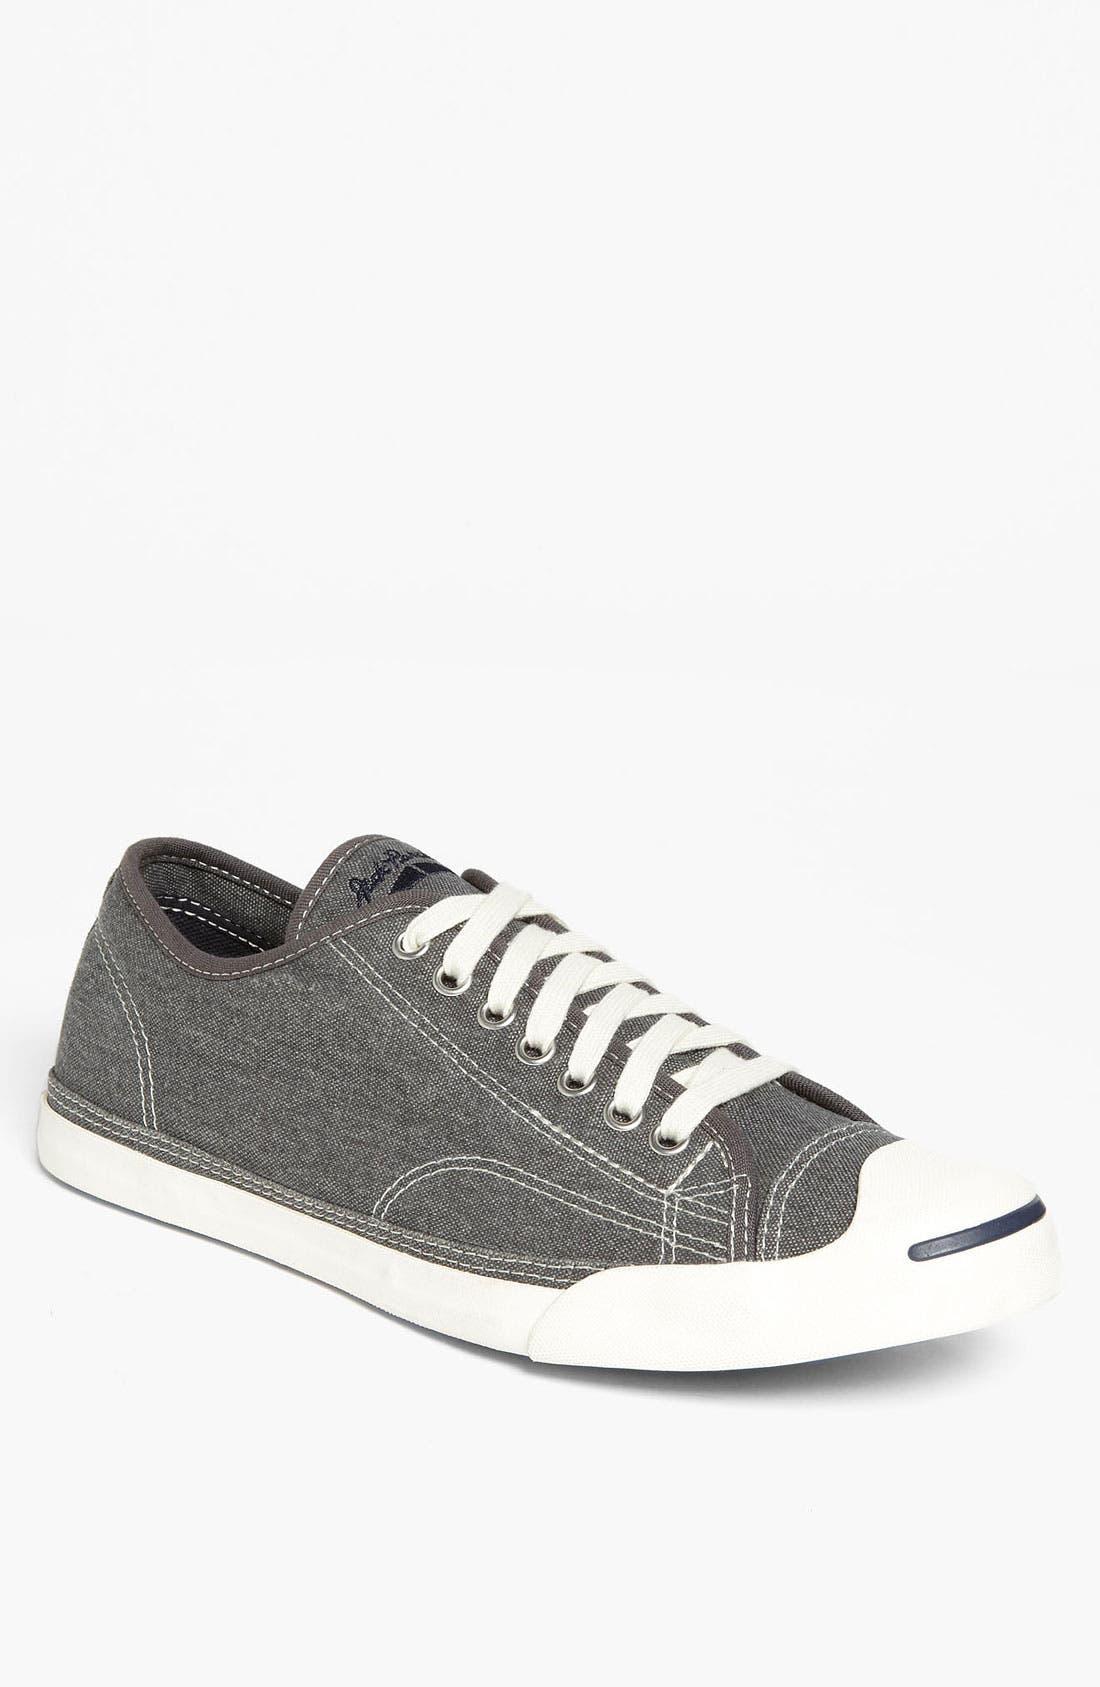 Main Image - Converse 'Jack Purcell LP' Sneaker (Men)